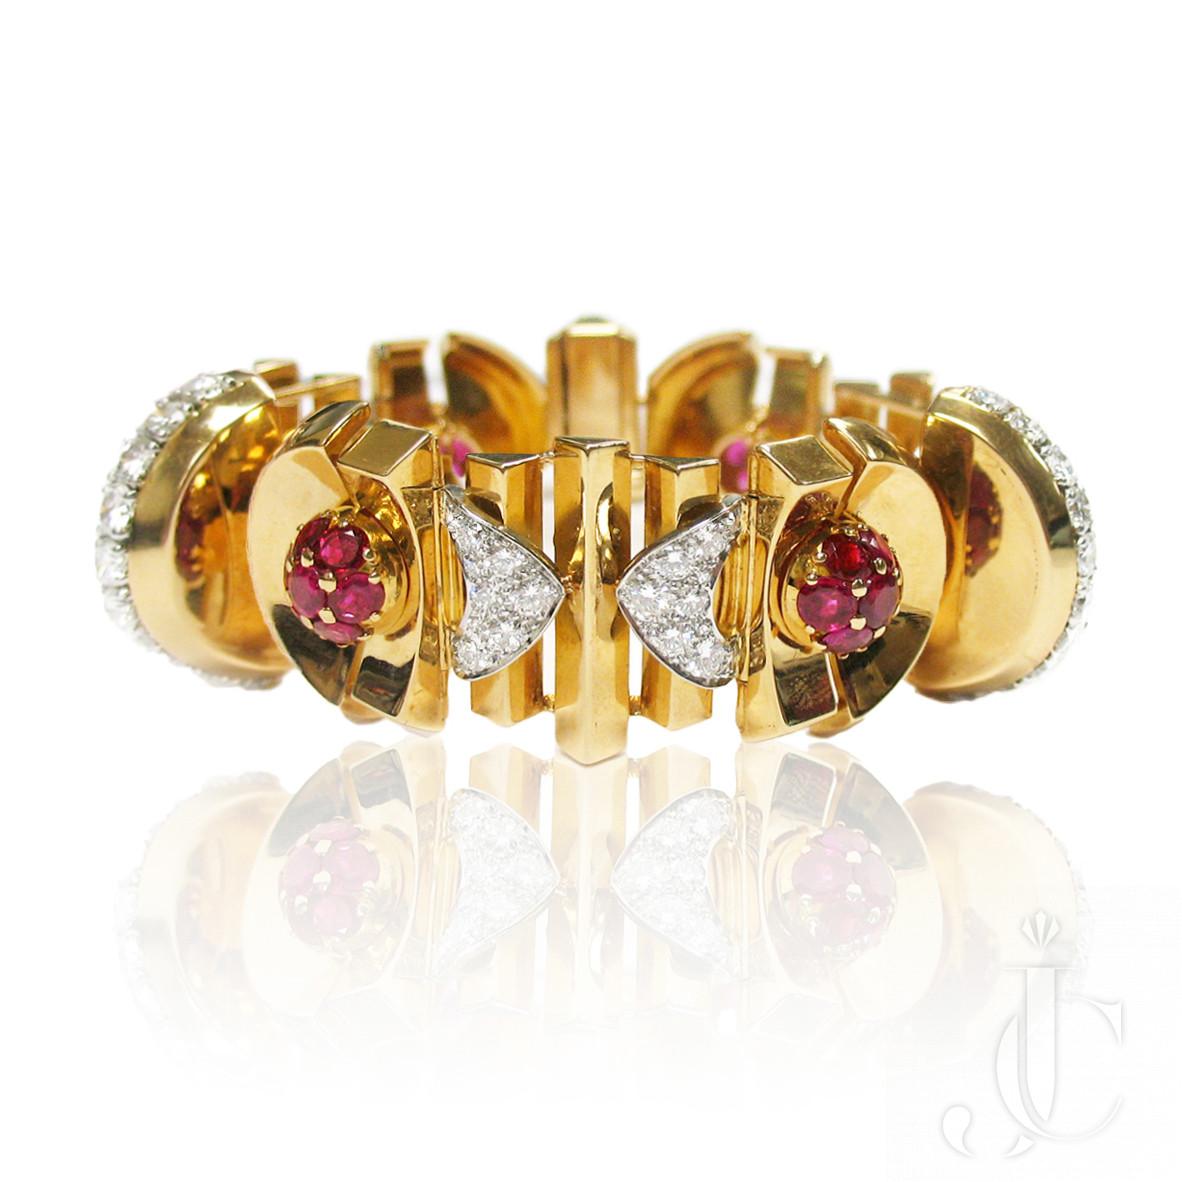 18kt YG Ruby and Diamond Retro Bracelet